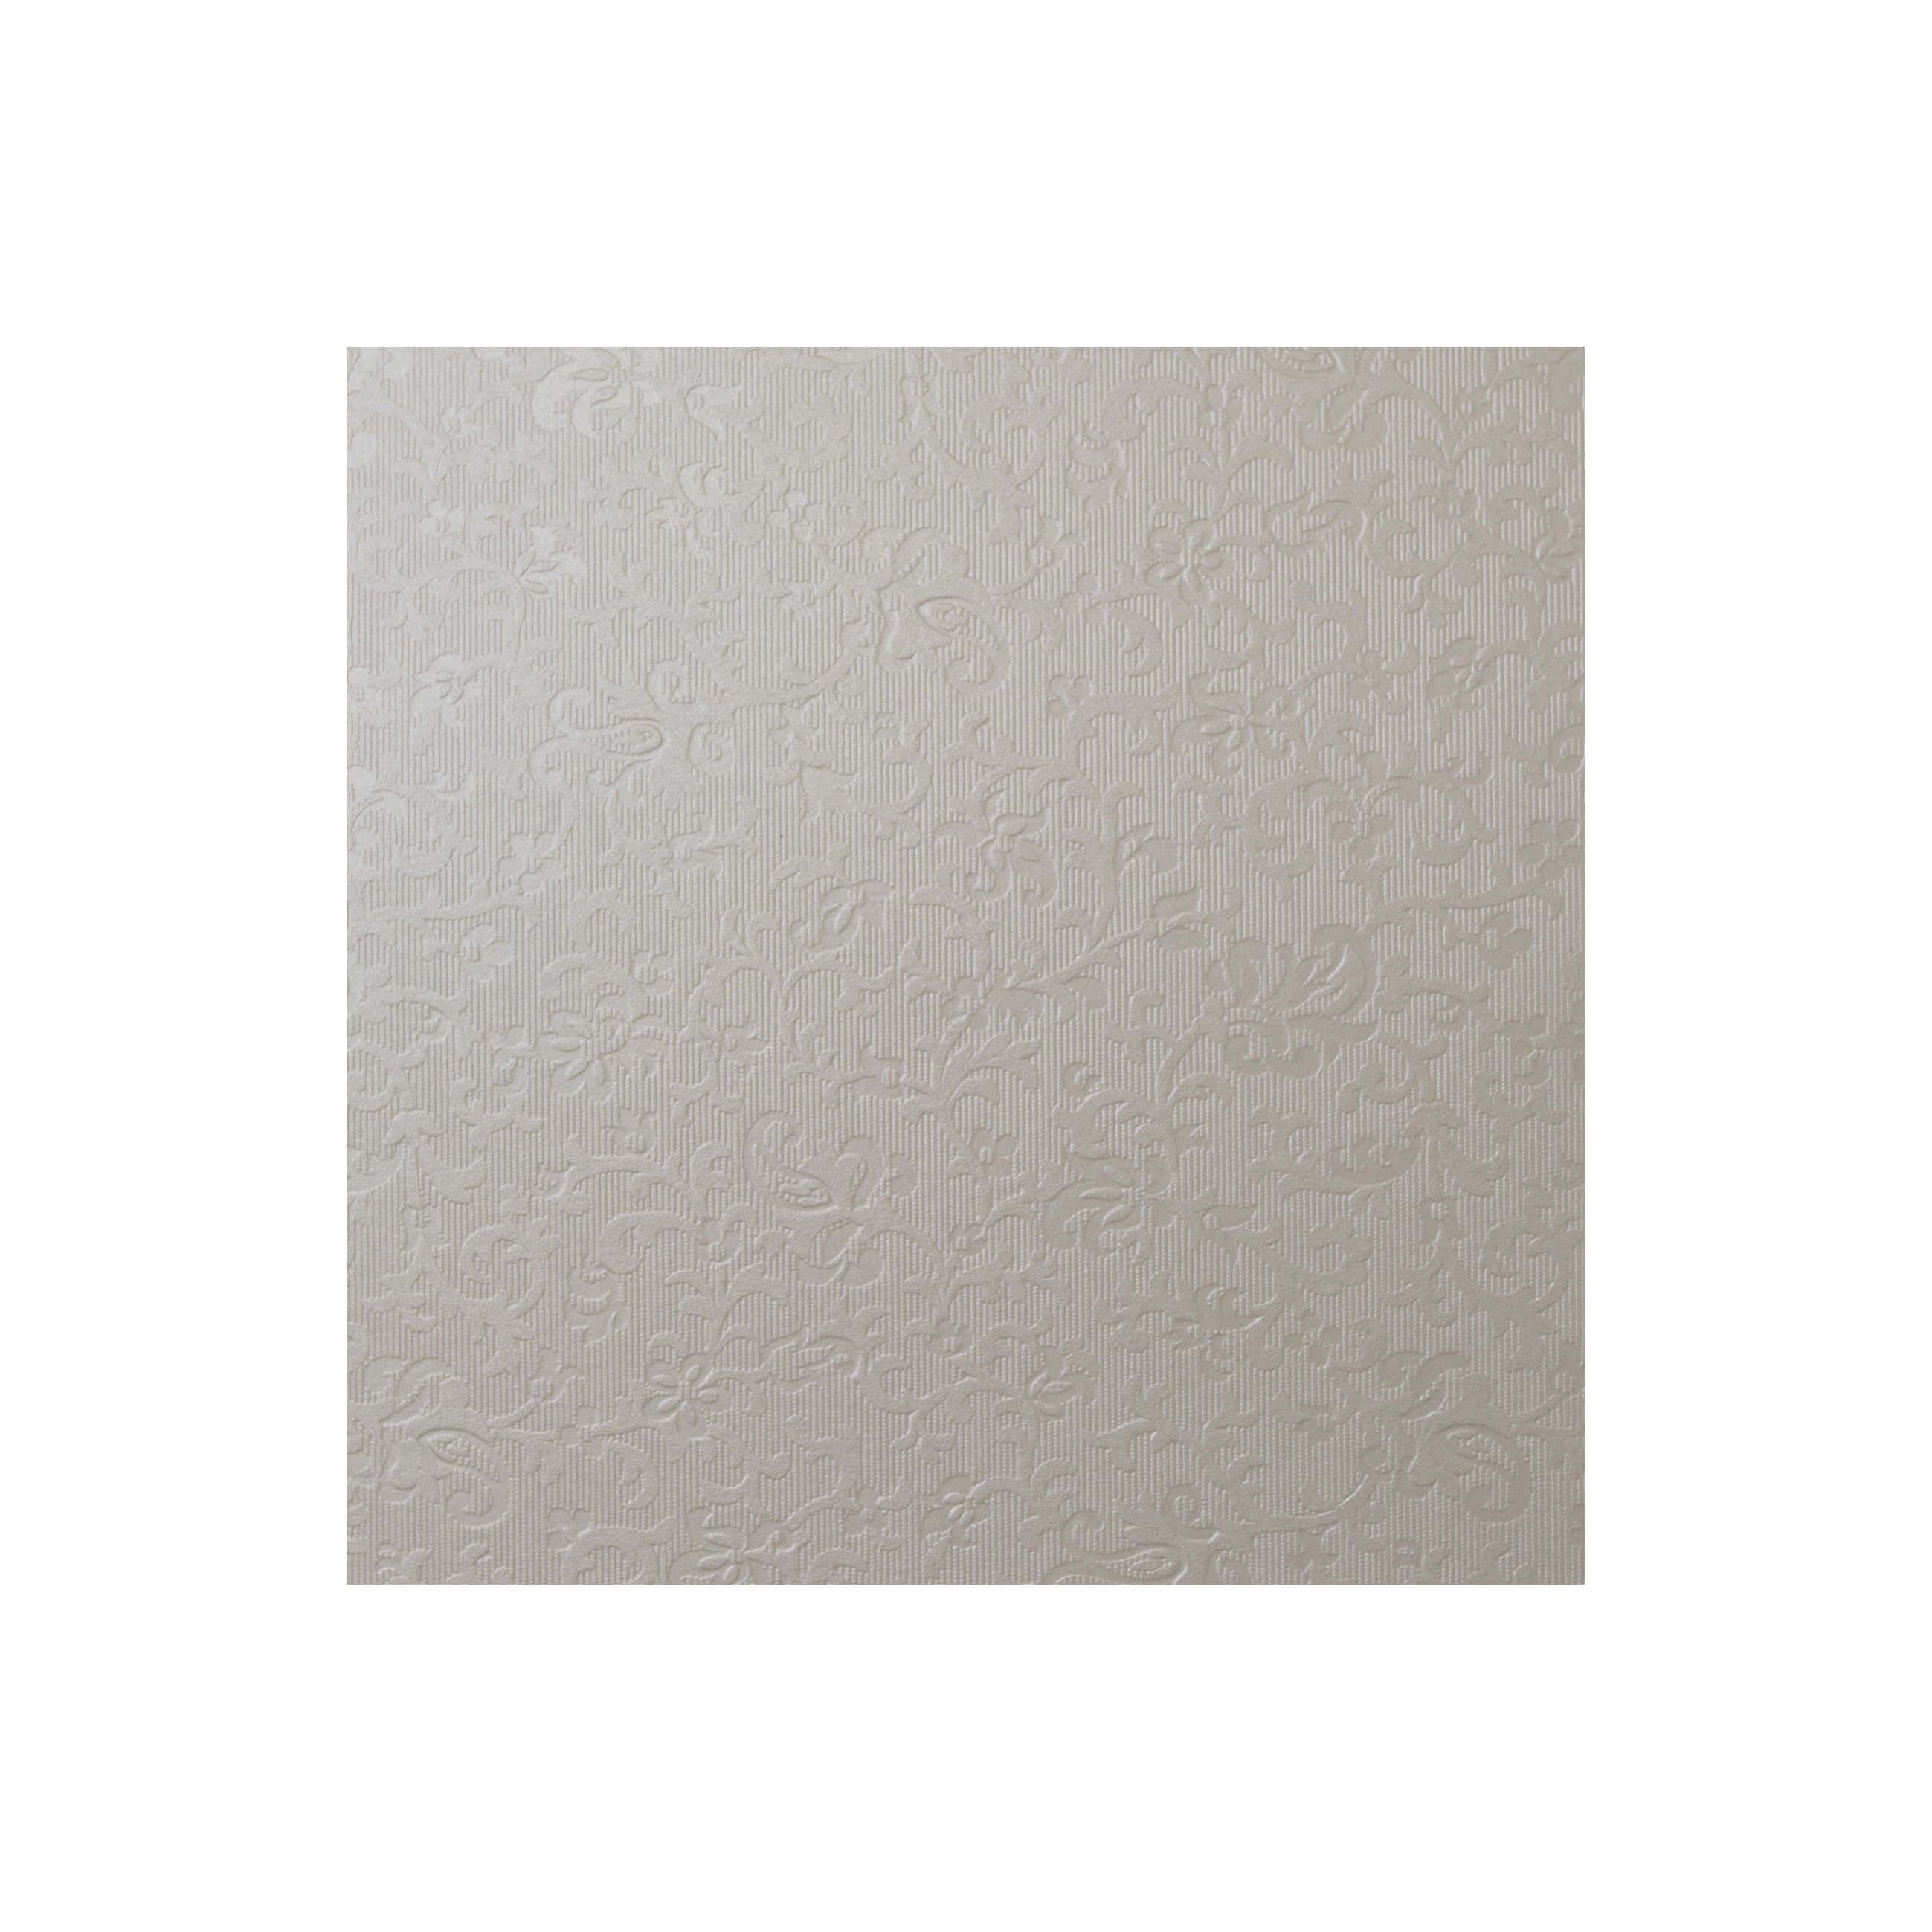 Cardstock 141mm Square - Applique Ivory